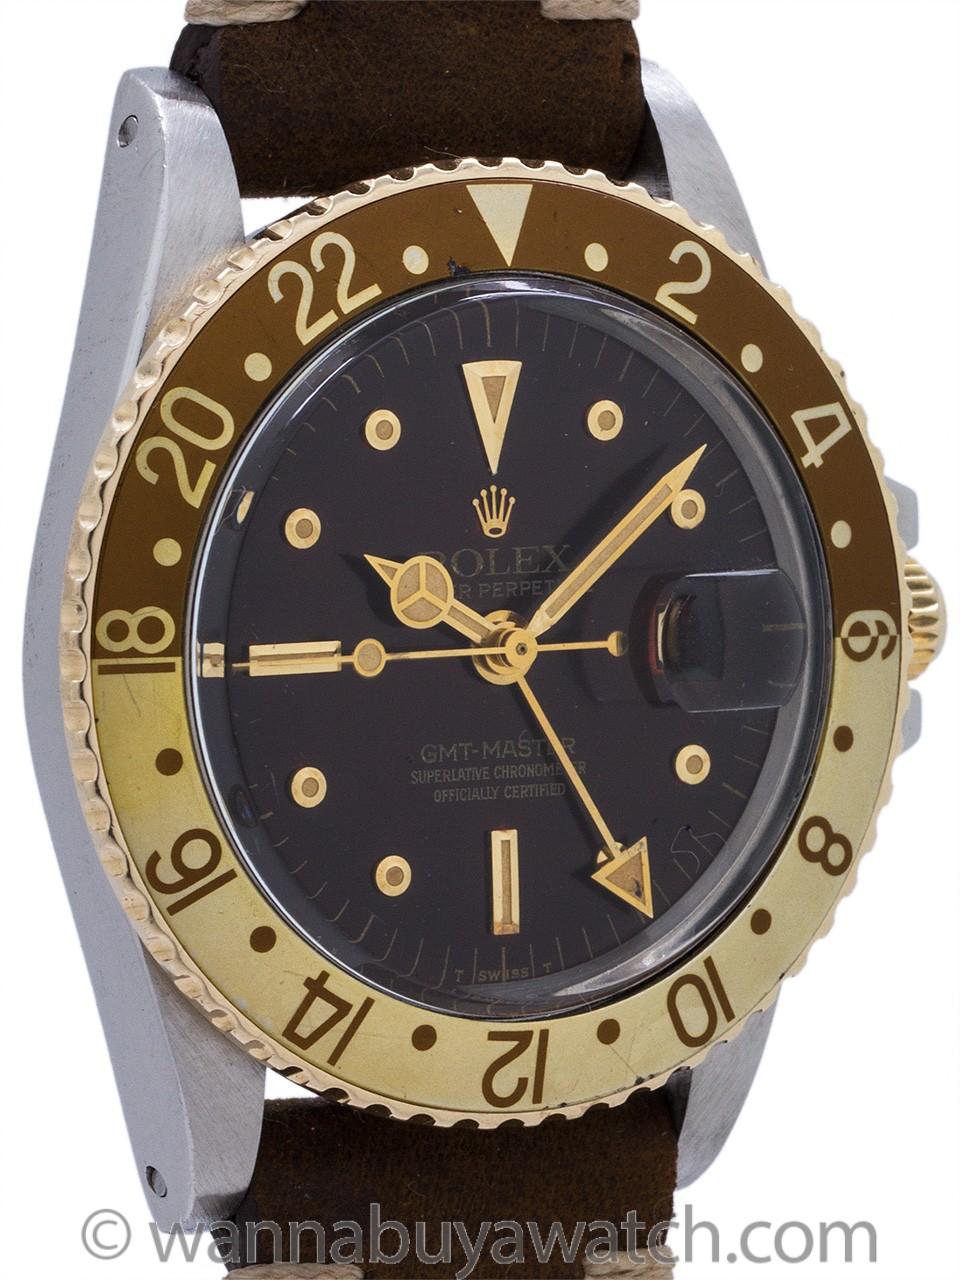 Rolex GMT-Master ref# 1675 SS/14K YG circa 1978